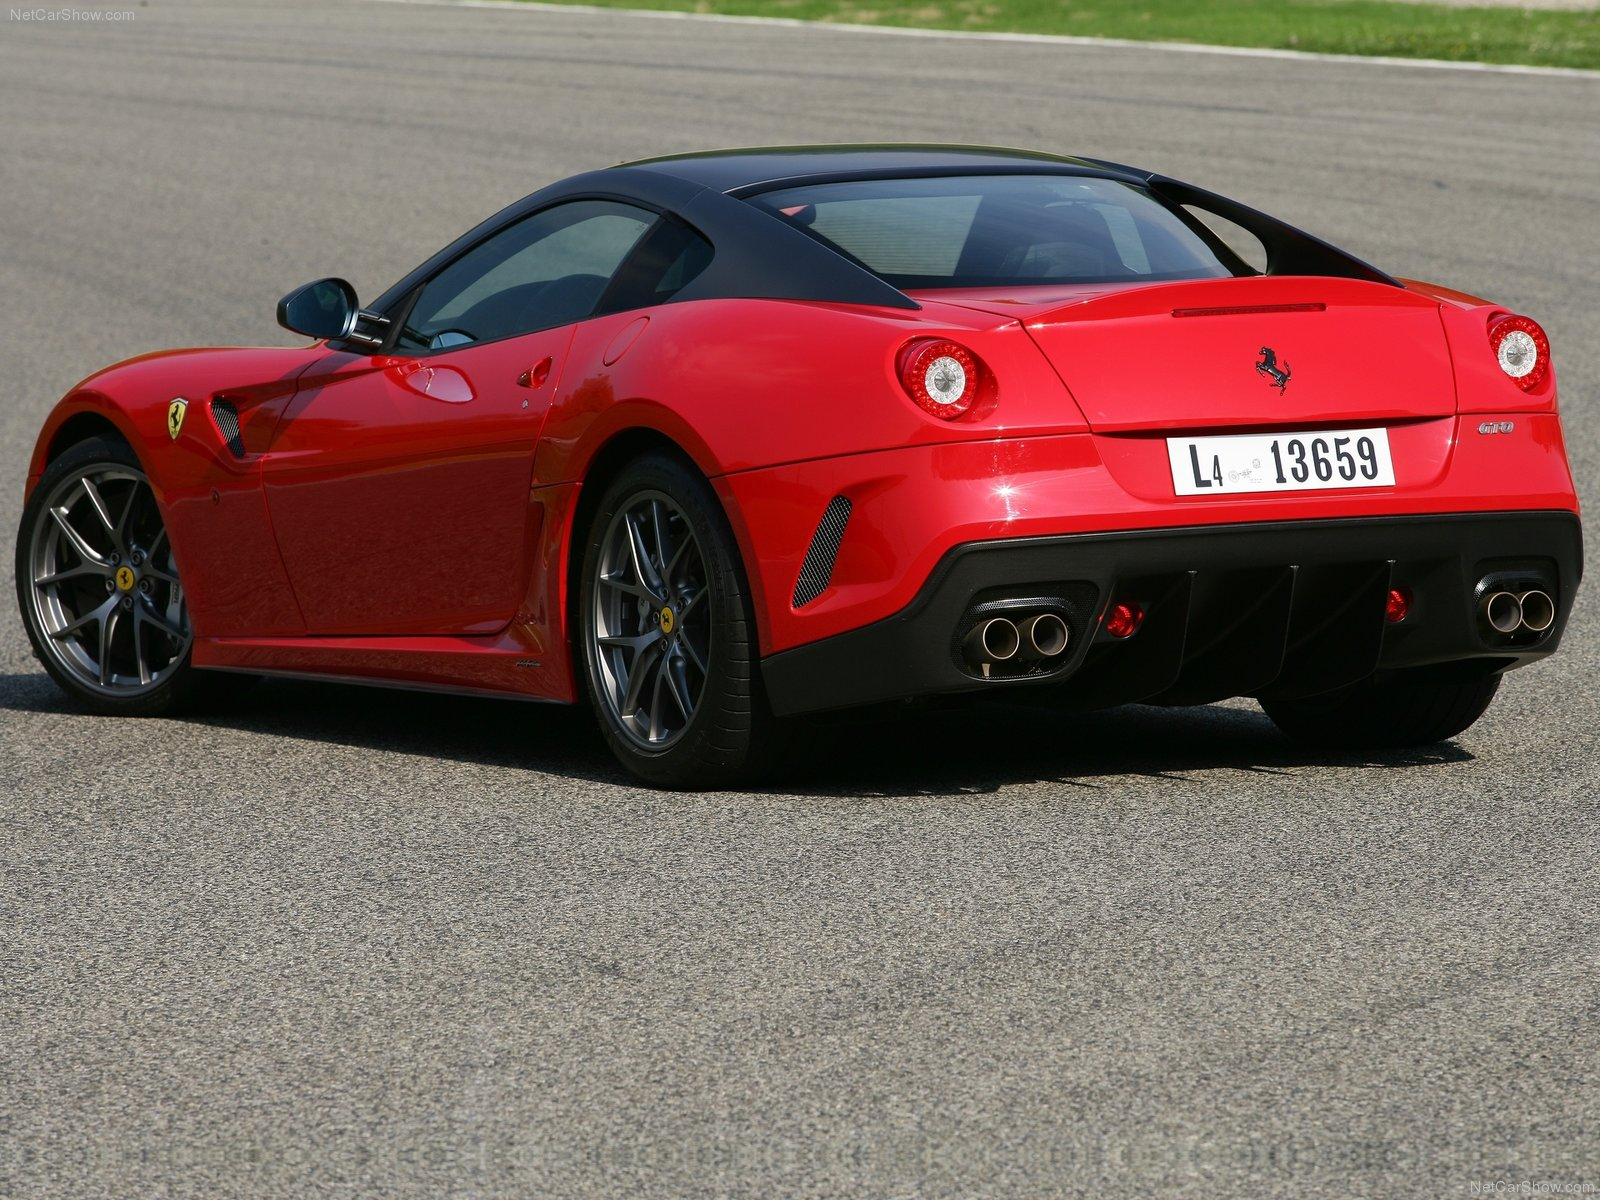 Ferrari 599 related imagesstart 0 weili automotive network ferrari 599 gto photo 74363 vanachro Image collections